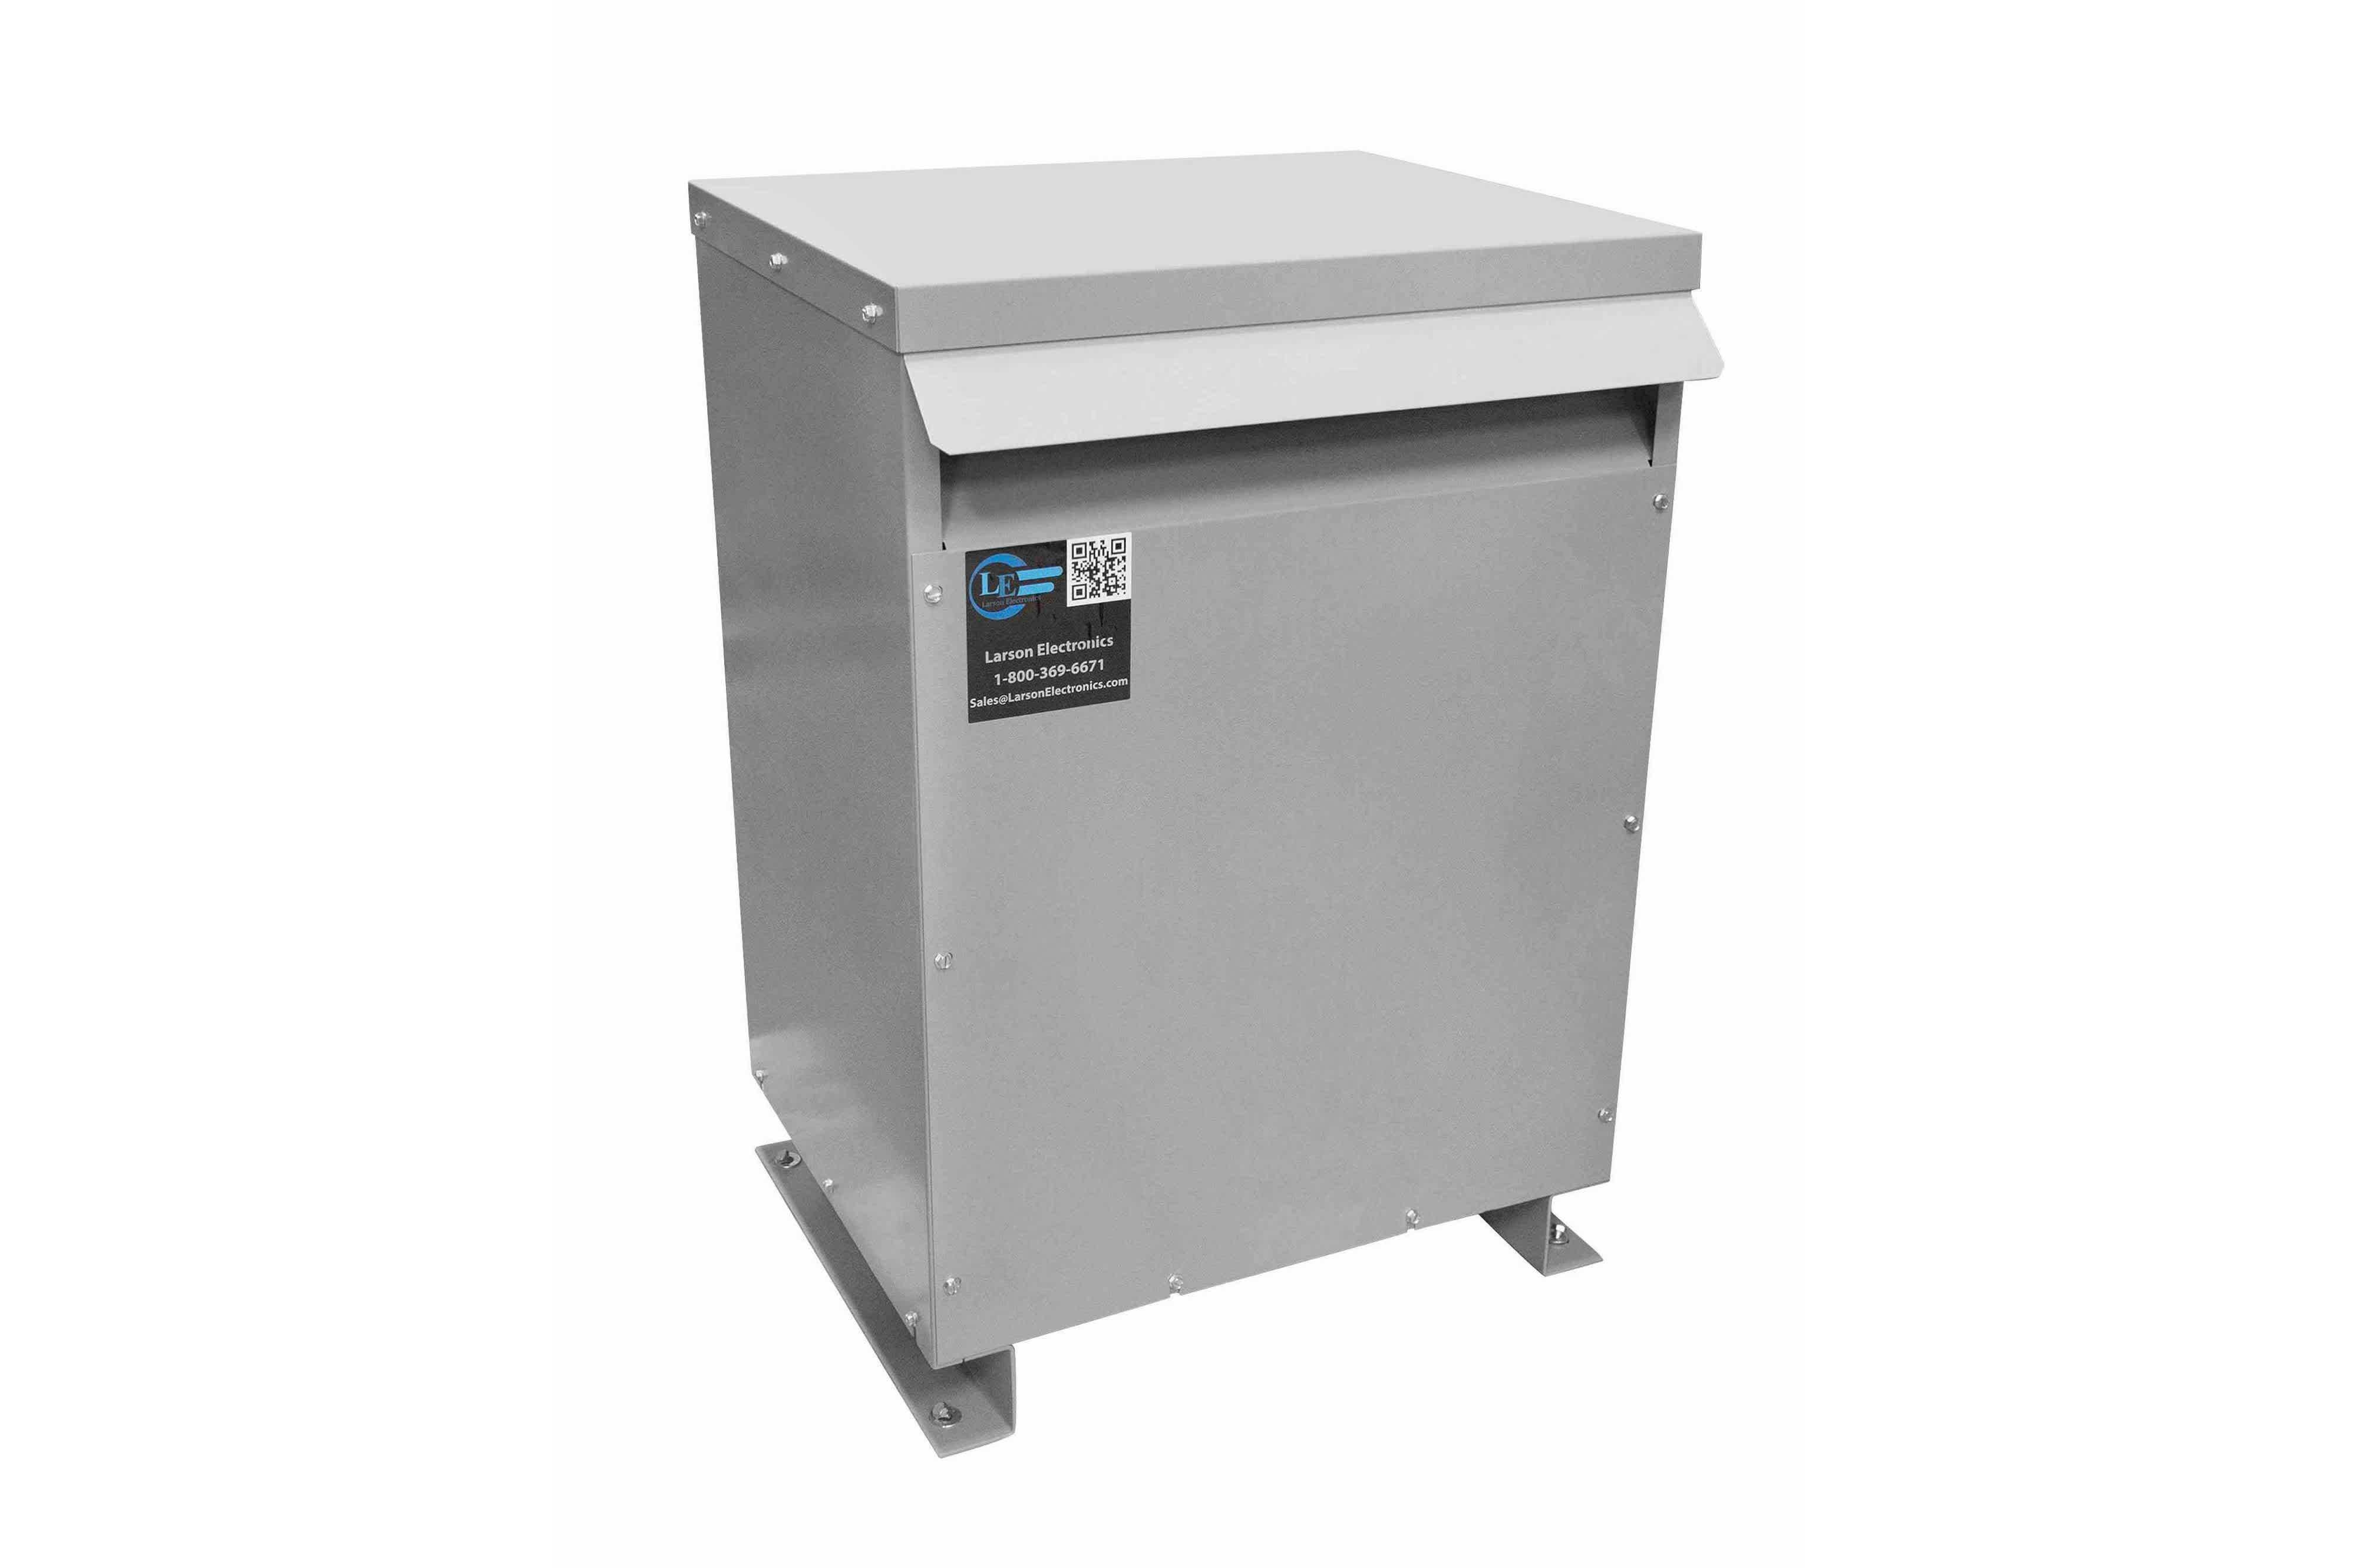 22.5 kVA 3PH Isolation Transformer, 208V Wye Primary, 480Y/277 Wye-N Secondary, N3R, Ventilated, 60 Hz